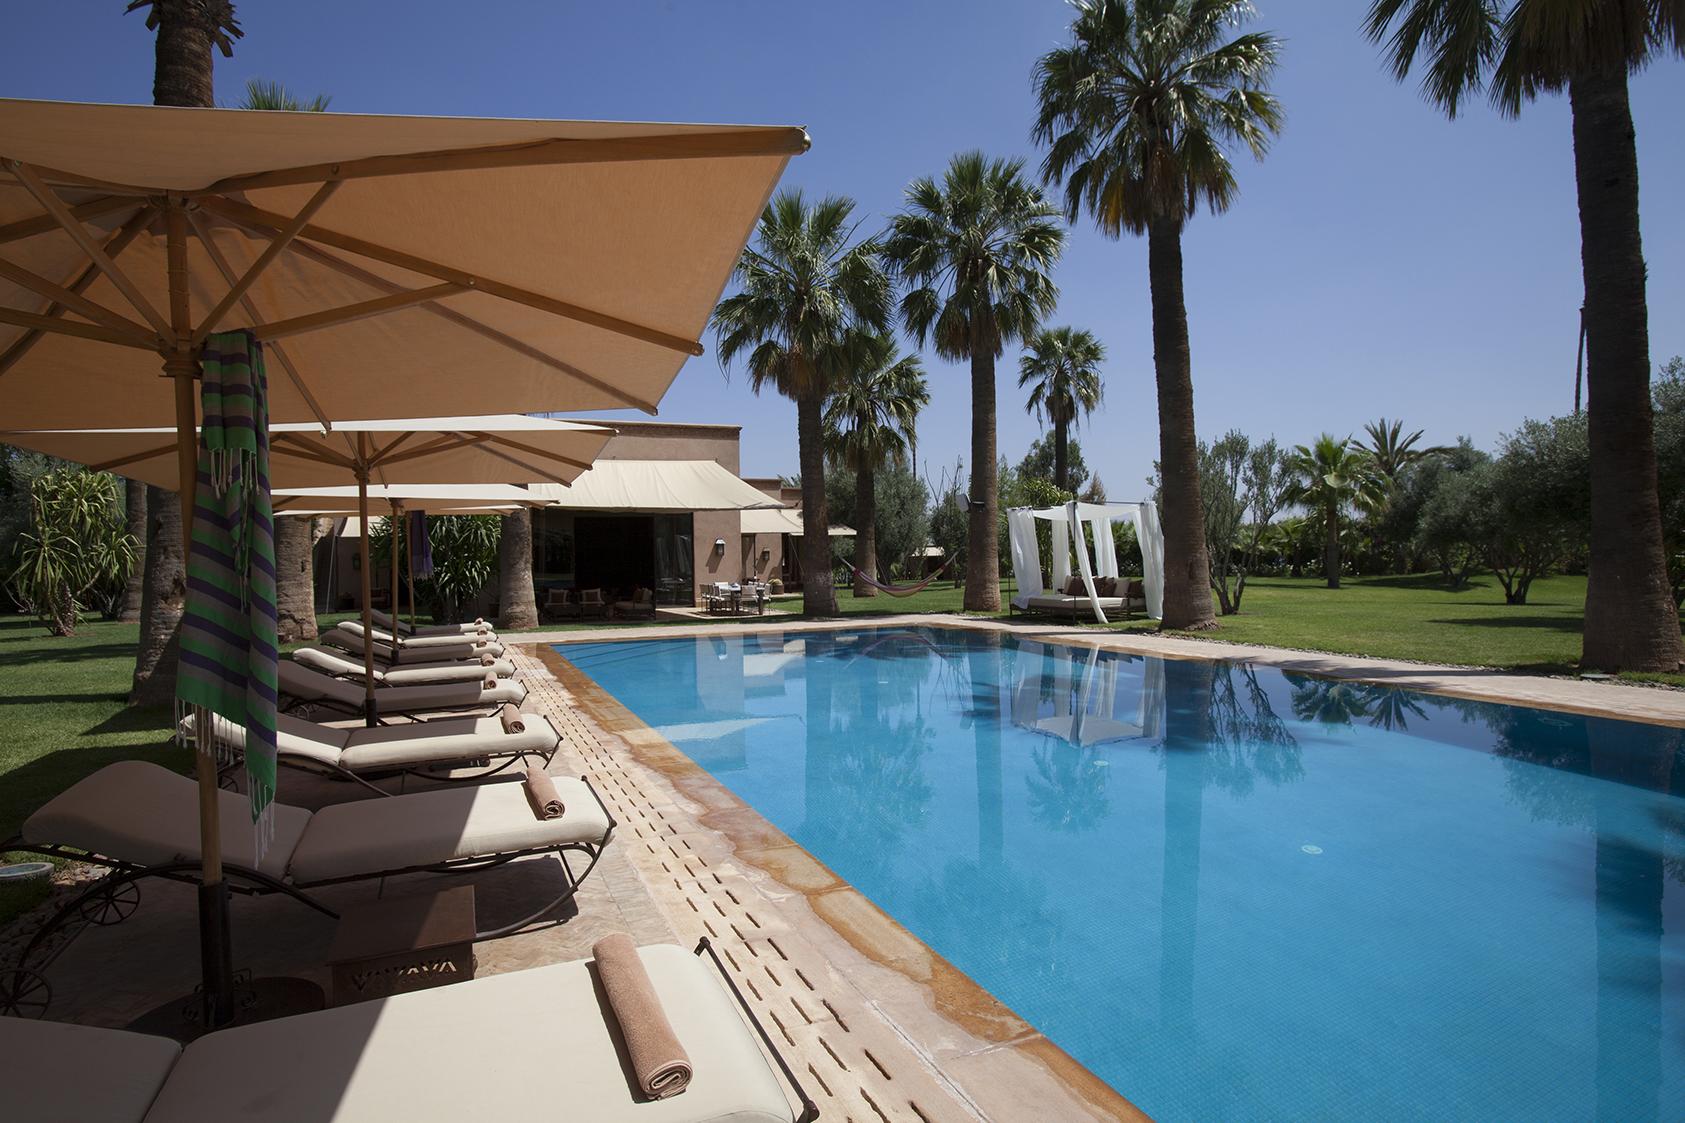 Location villa prestige marrakech galerie photos for Villa marrakech piscine